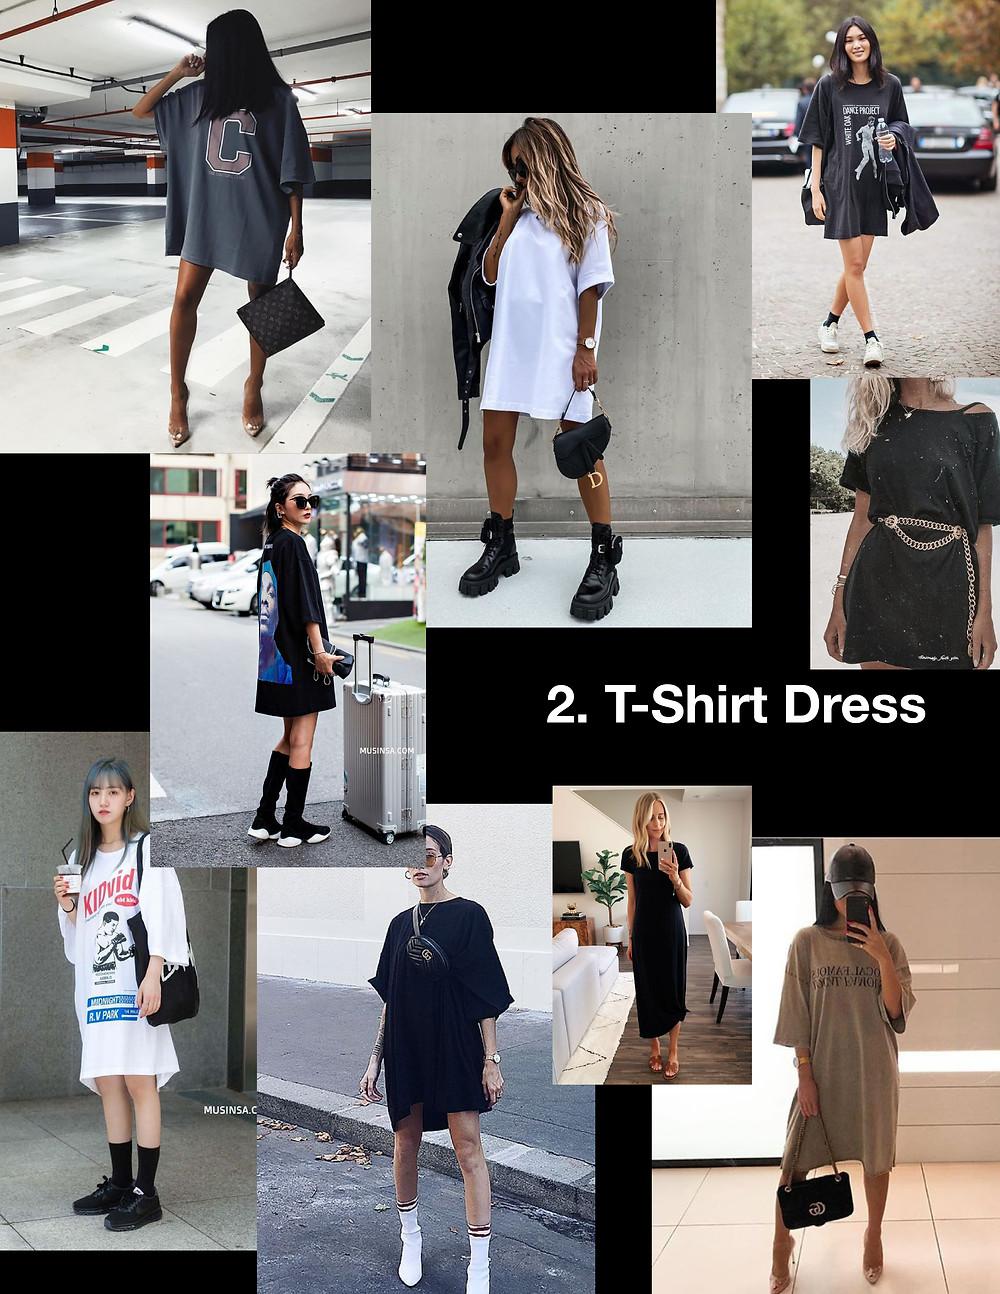 summer dresses 2021, style tips, fashion, shopping, trends, t-shirt dress, oversize, grunge